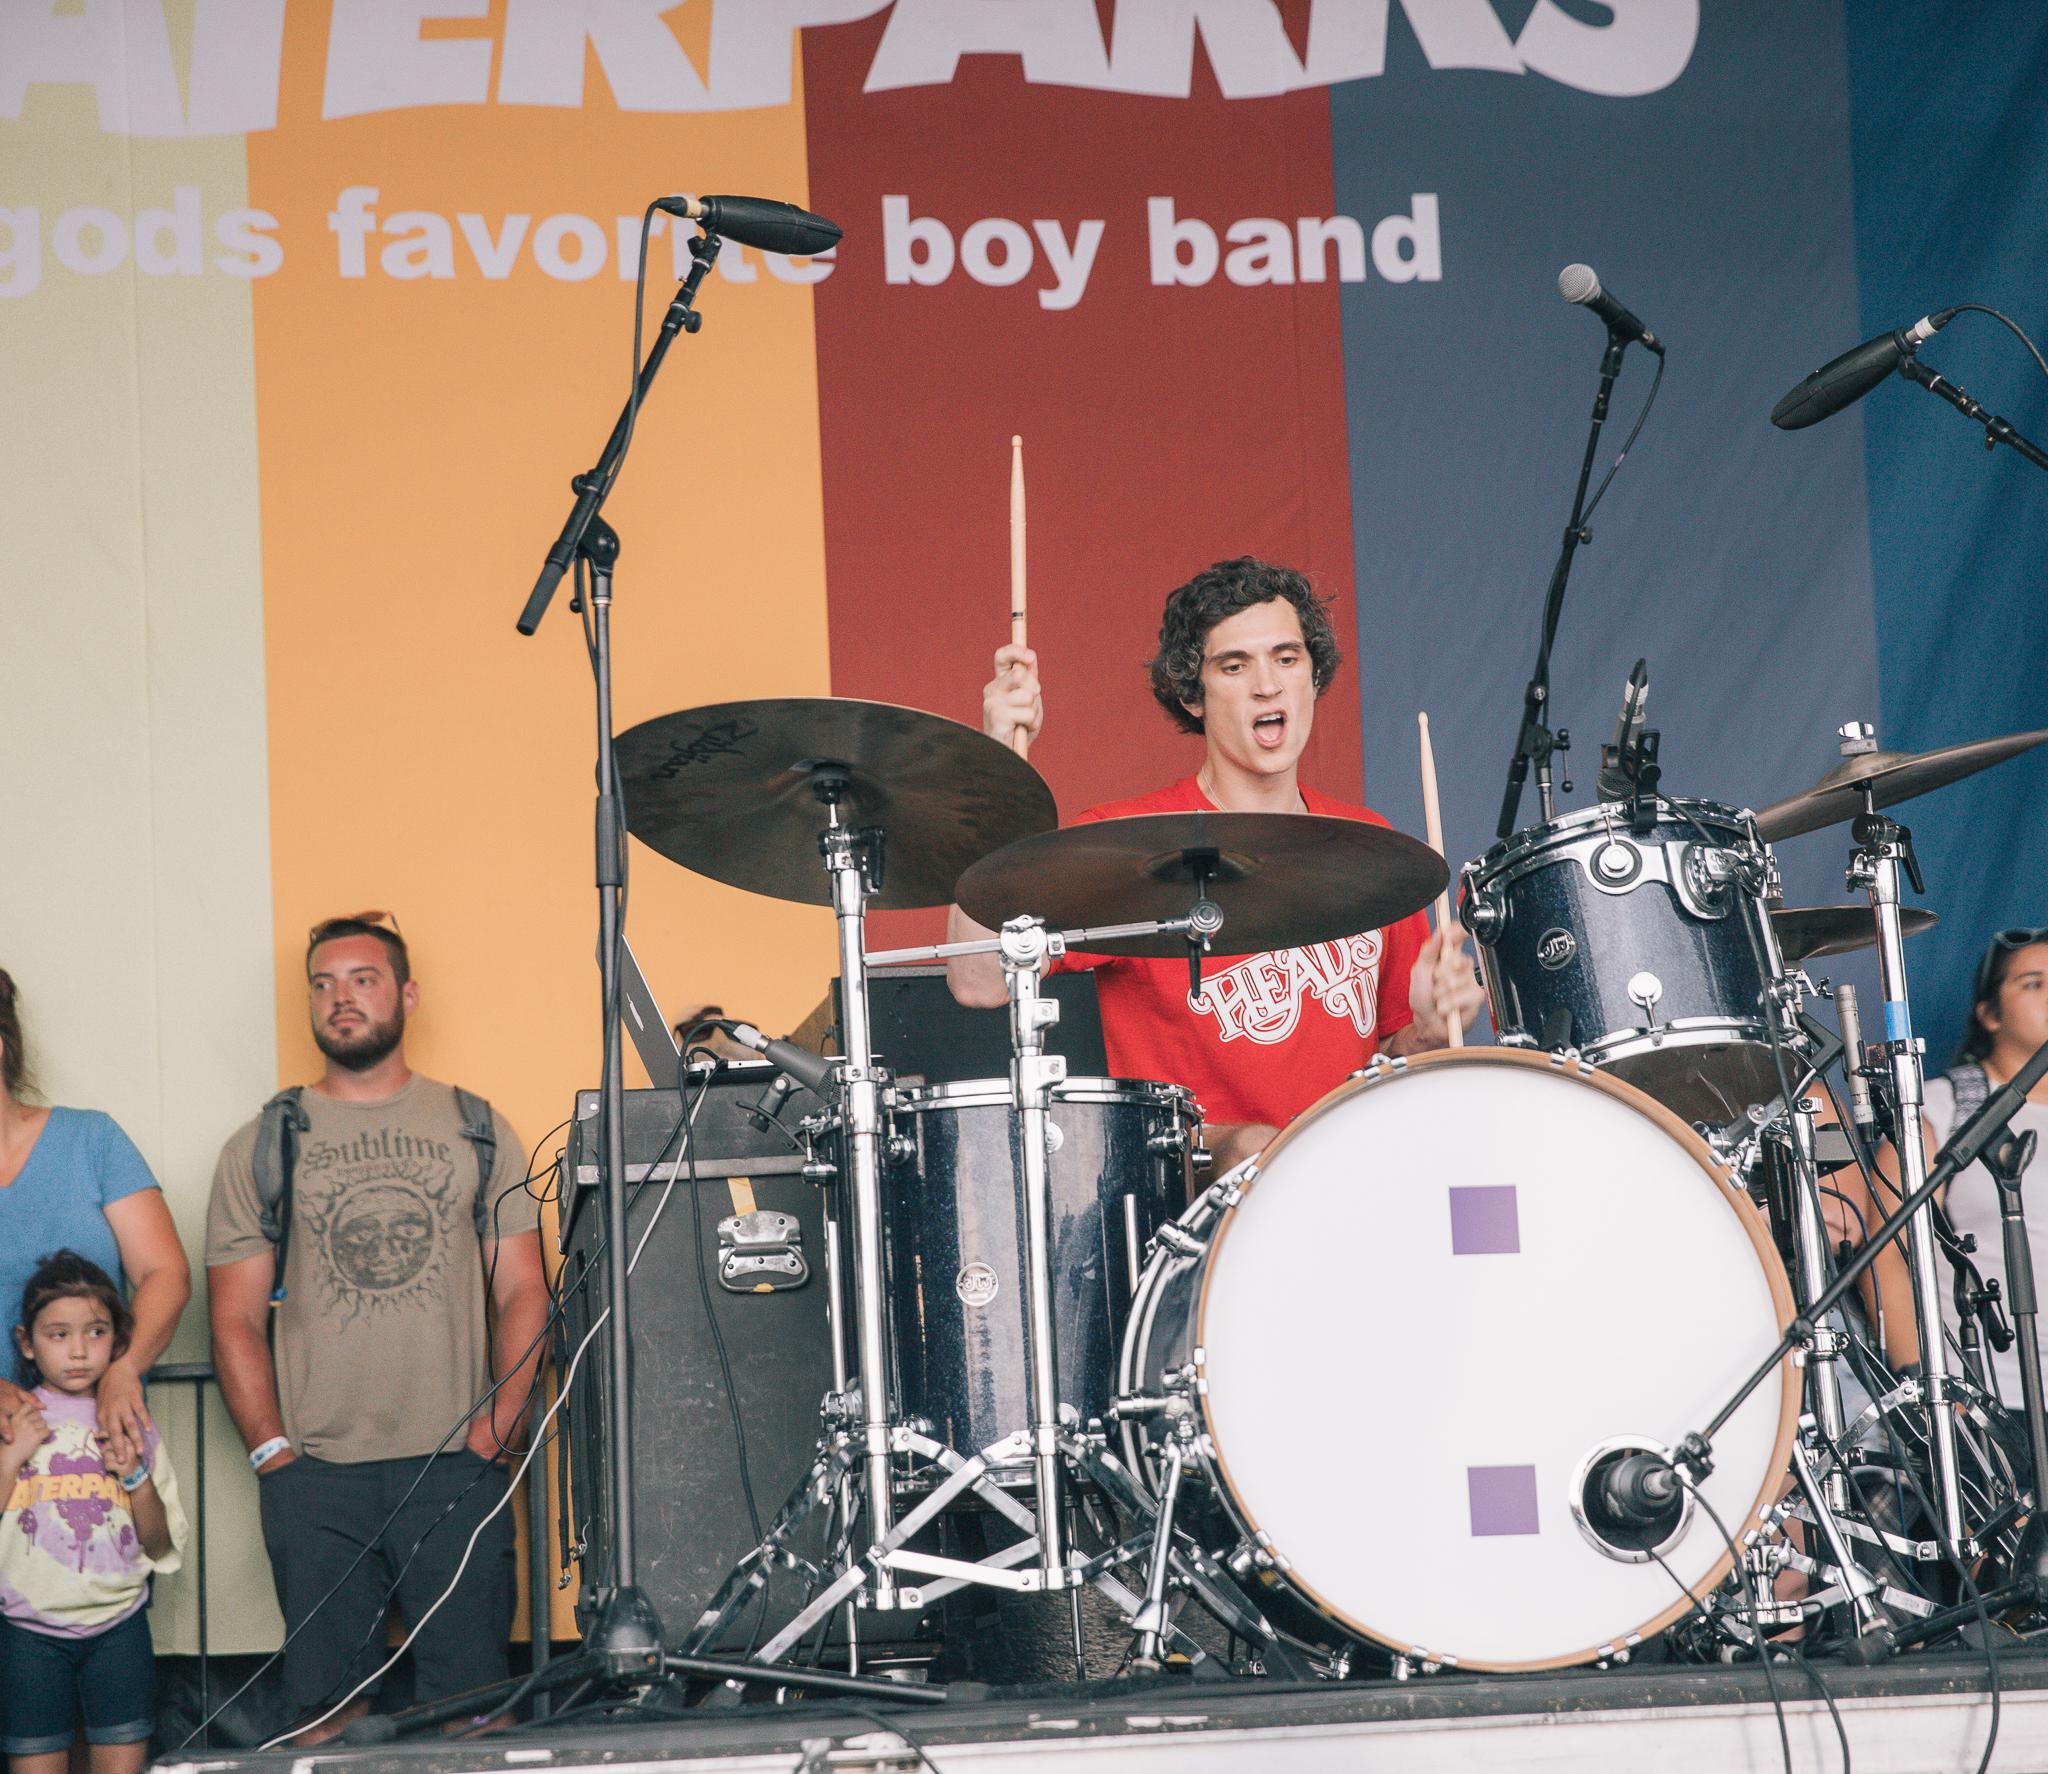 Waterparks at Warped Tour 2018 in San Antonio, TX.